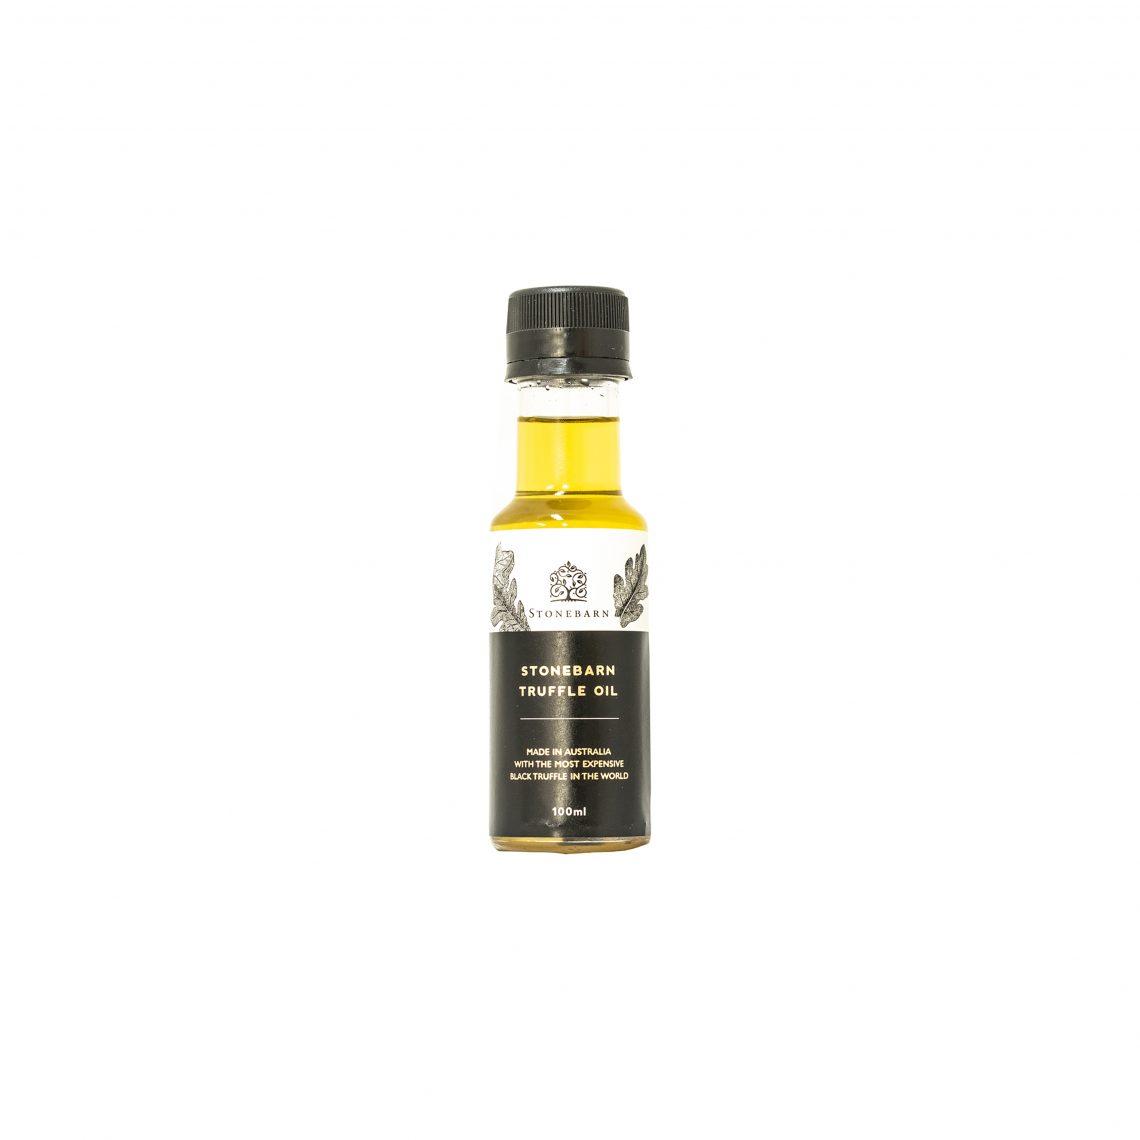 Stonebarn 100ml Truffle Oil